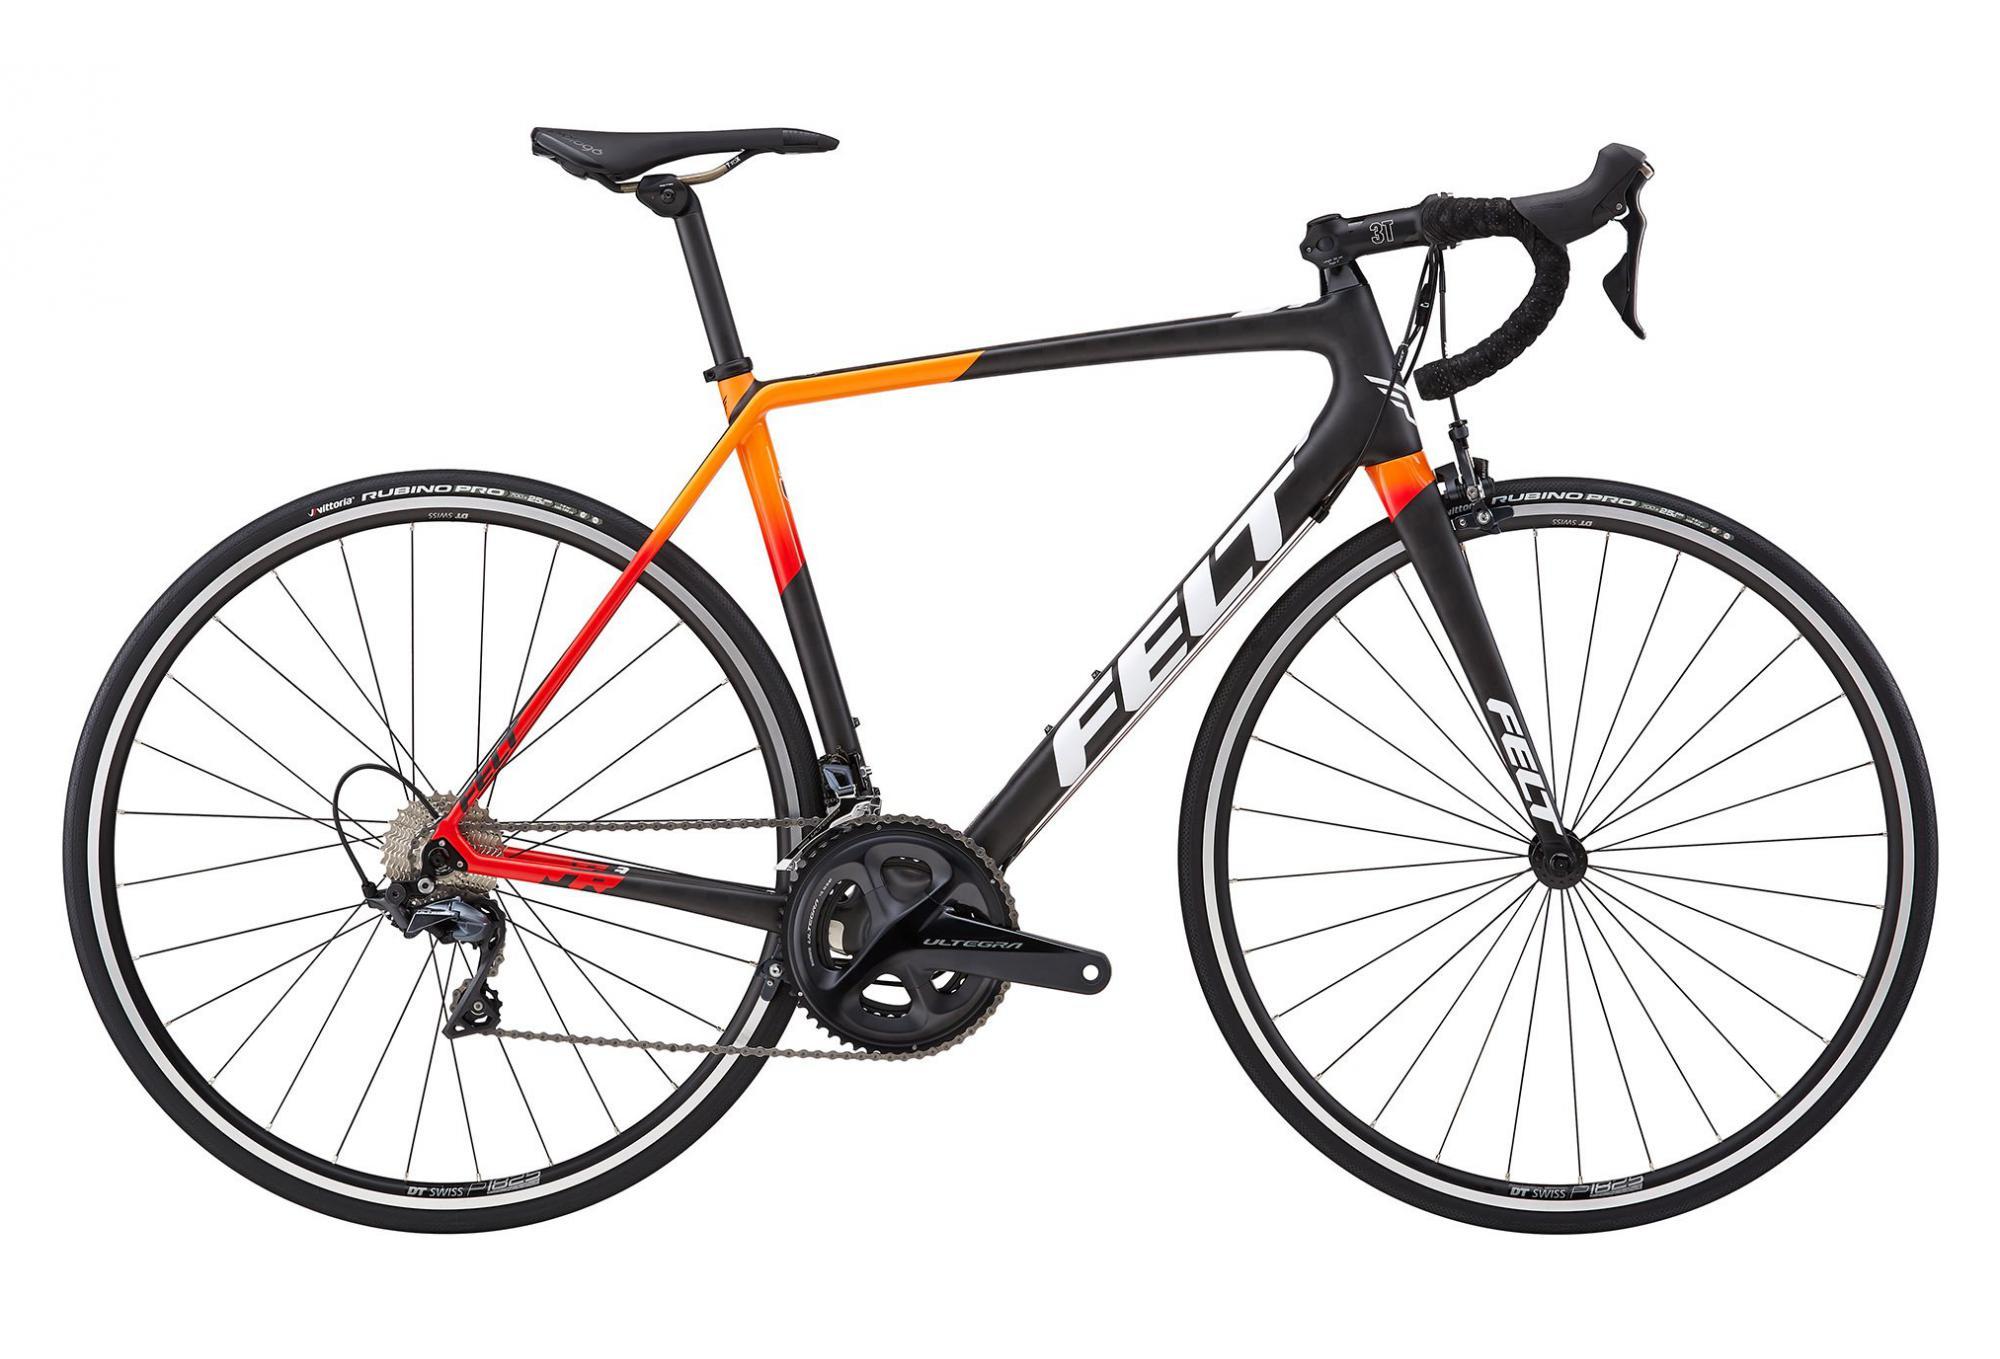 bf291a515b6 Felt FR3 Road Bike Shimano Ultegra 11s Black / Red / Orange 2019 ...